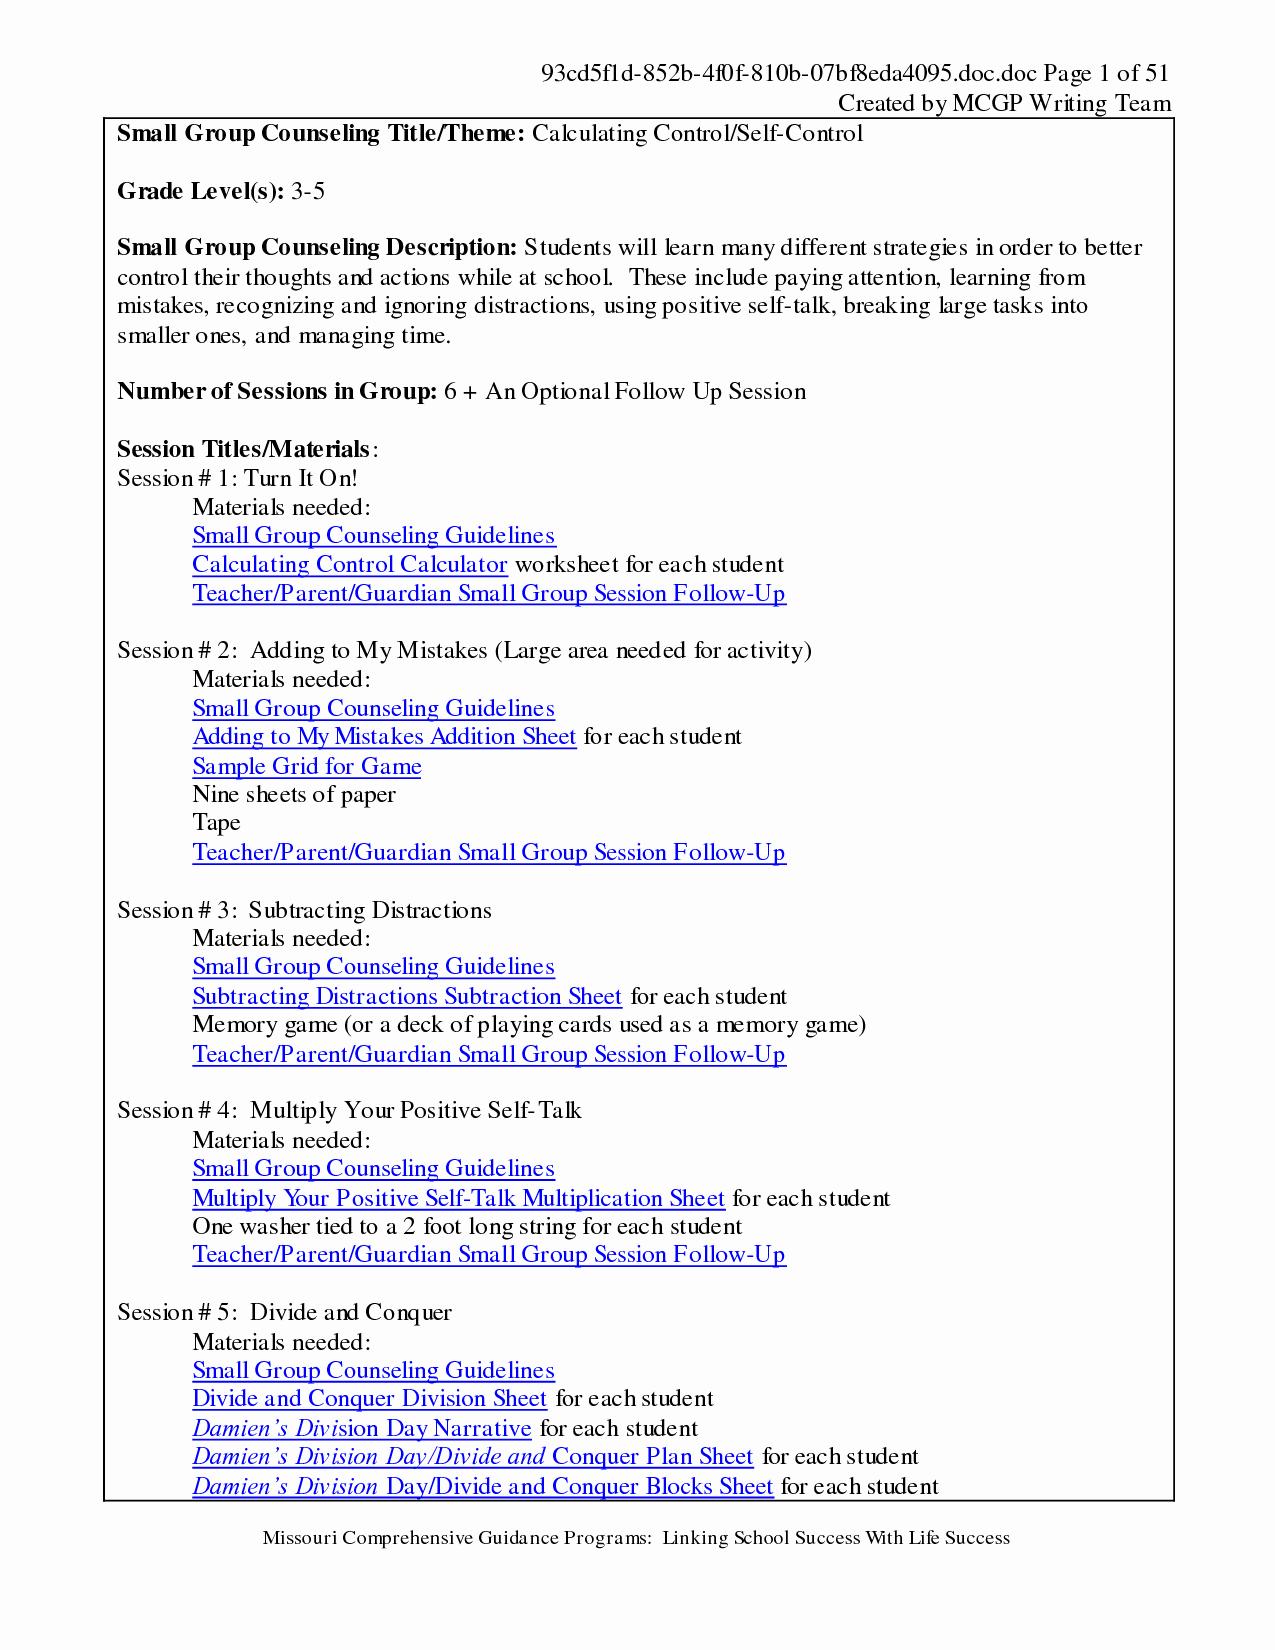 Positive Self Talk Worksheet New Positive Self Talk Worksheets